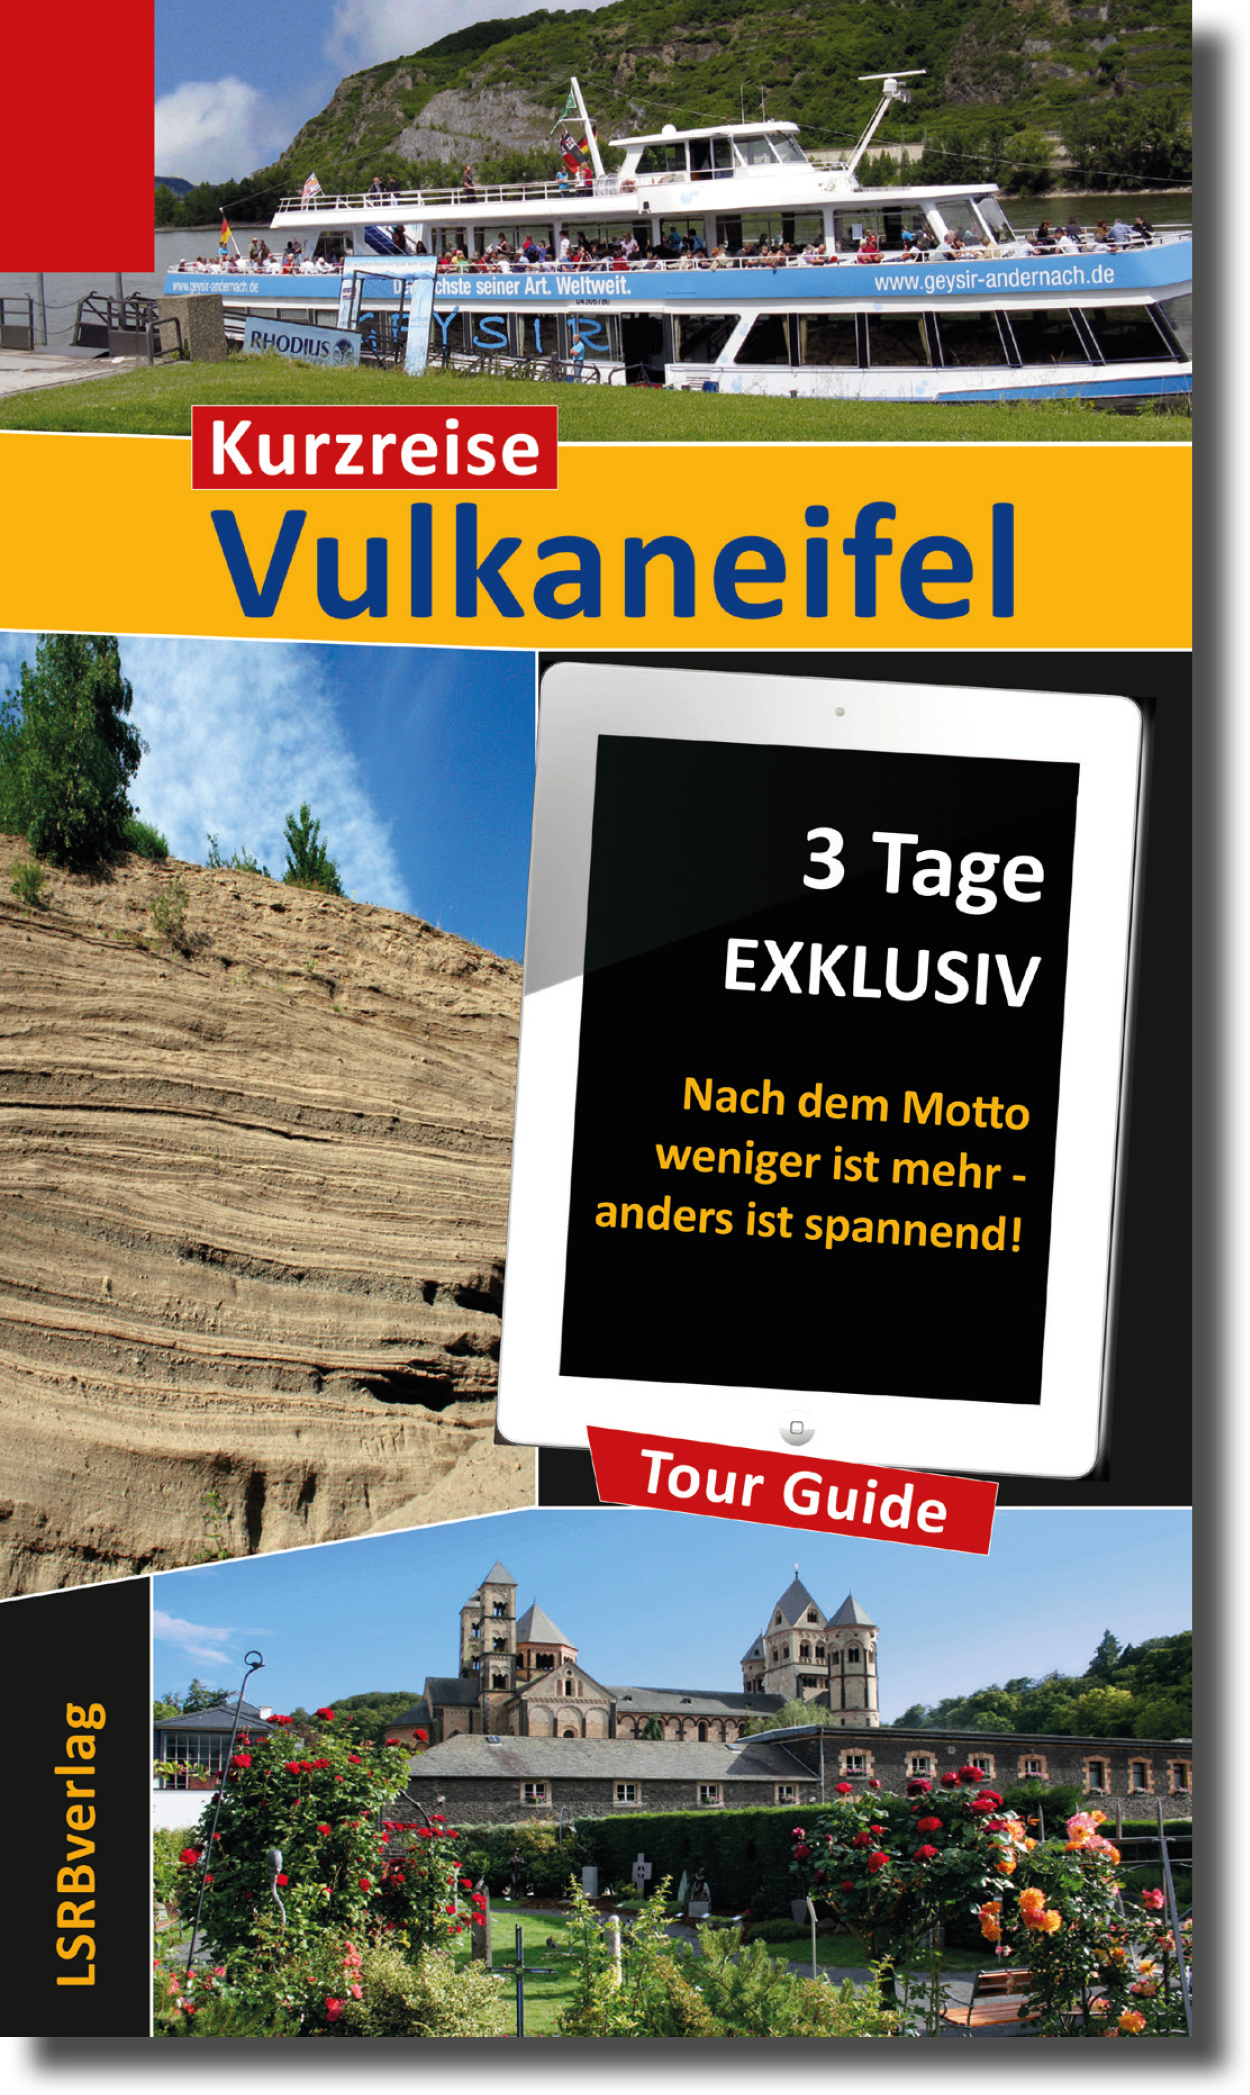 Kurzreise Vulkaneifel